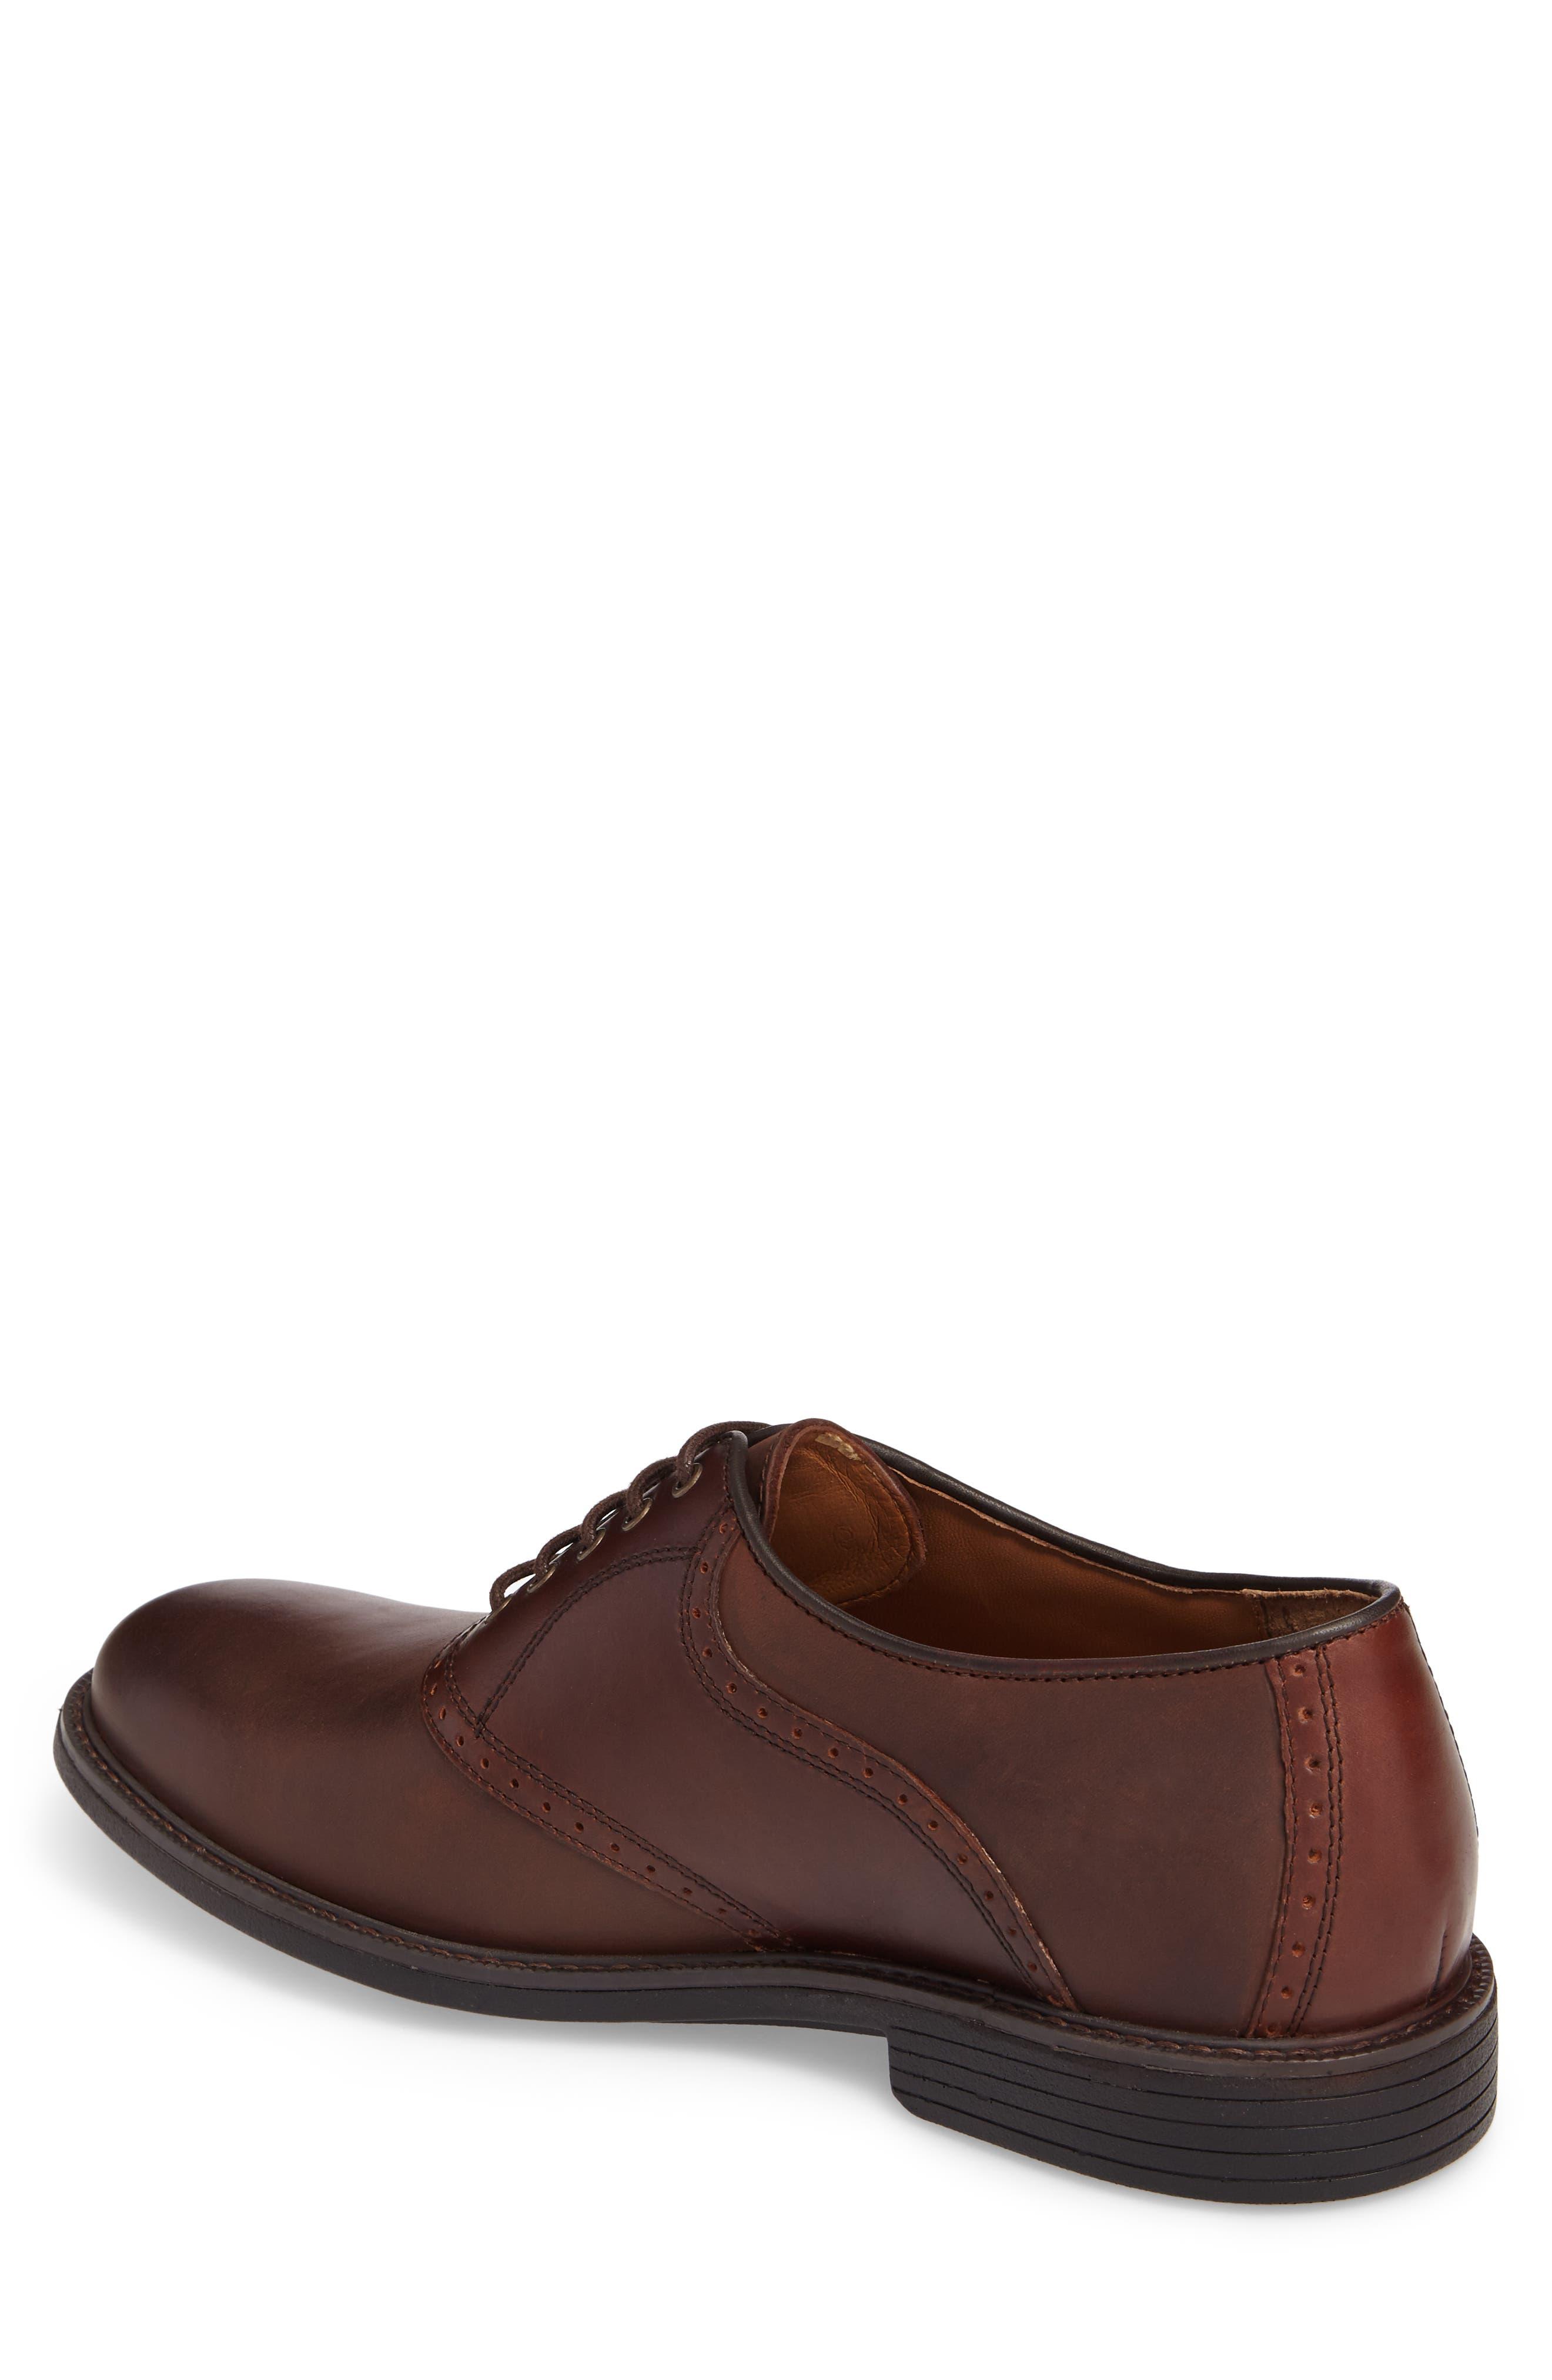 Hollis Waterproof Plain Toe Oxford,                             Alternate thumbnail 2, color,                             Brown